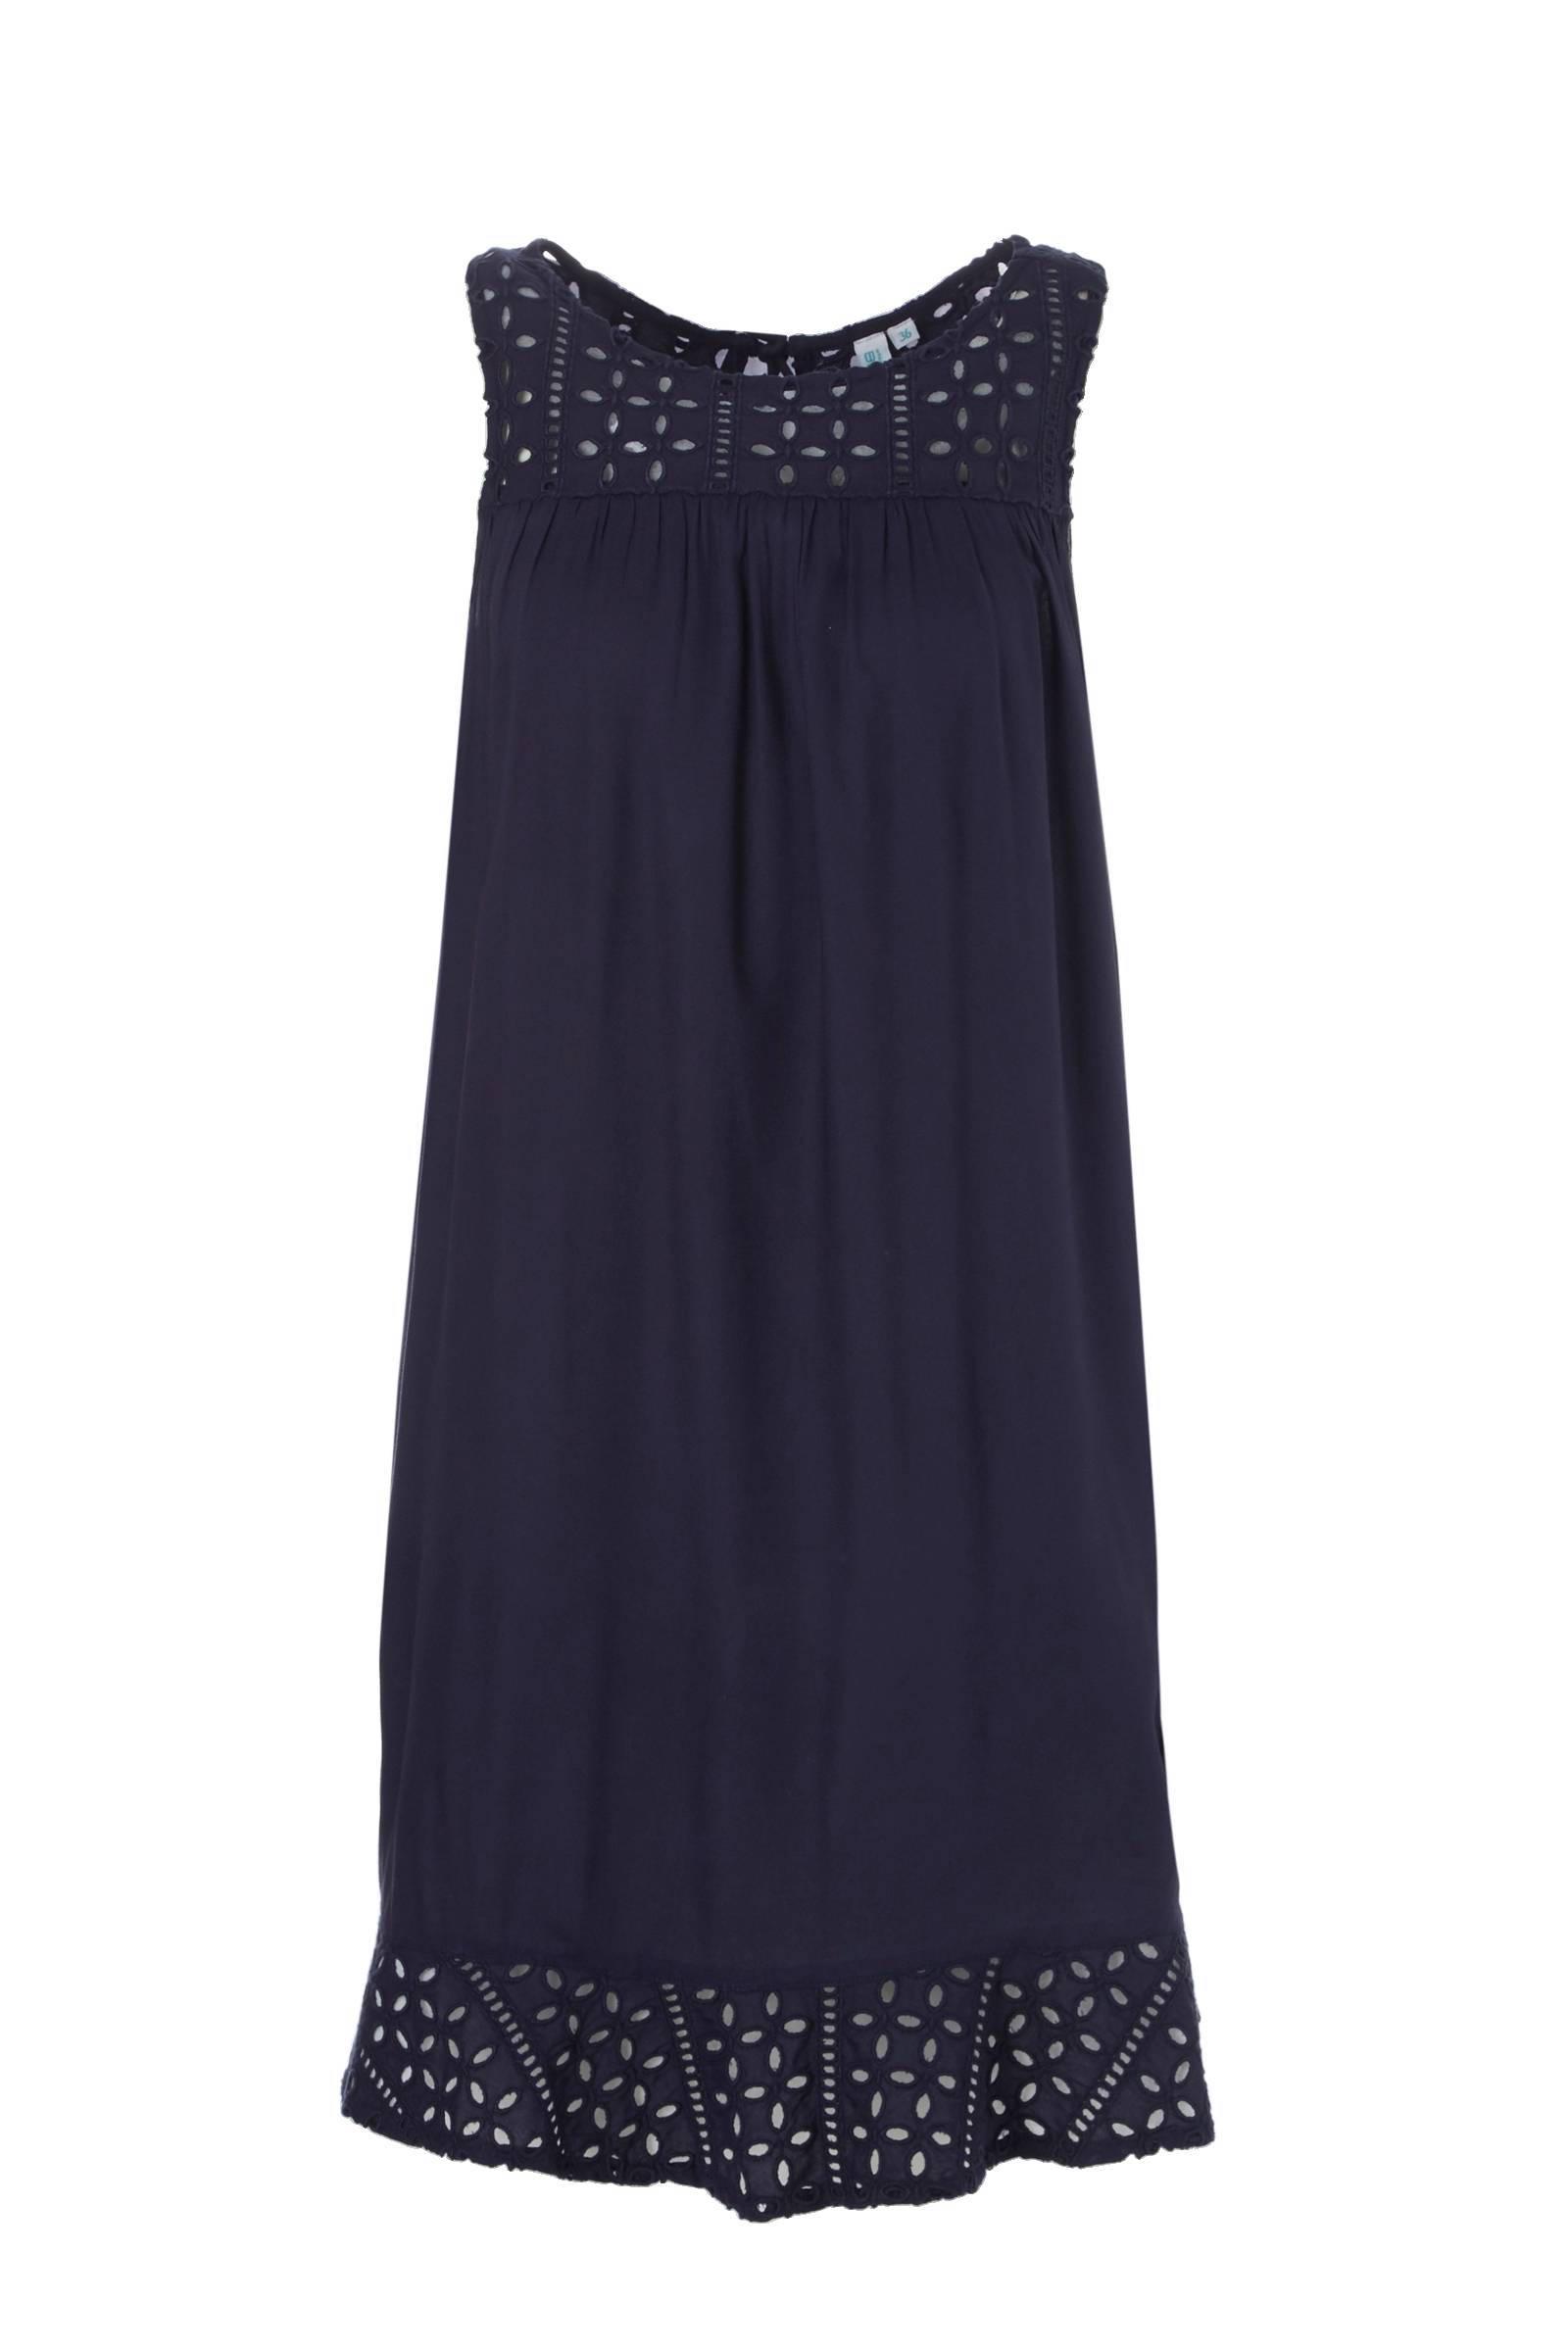 whkmp's beachwave mouwloze jurk